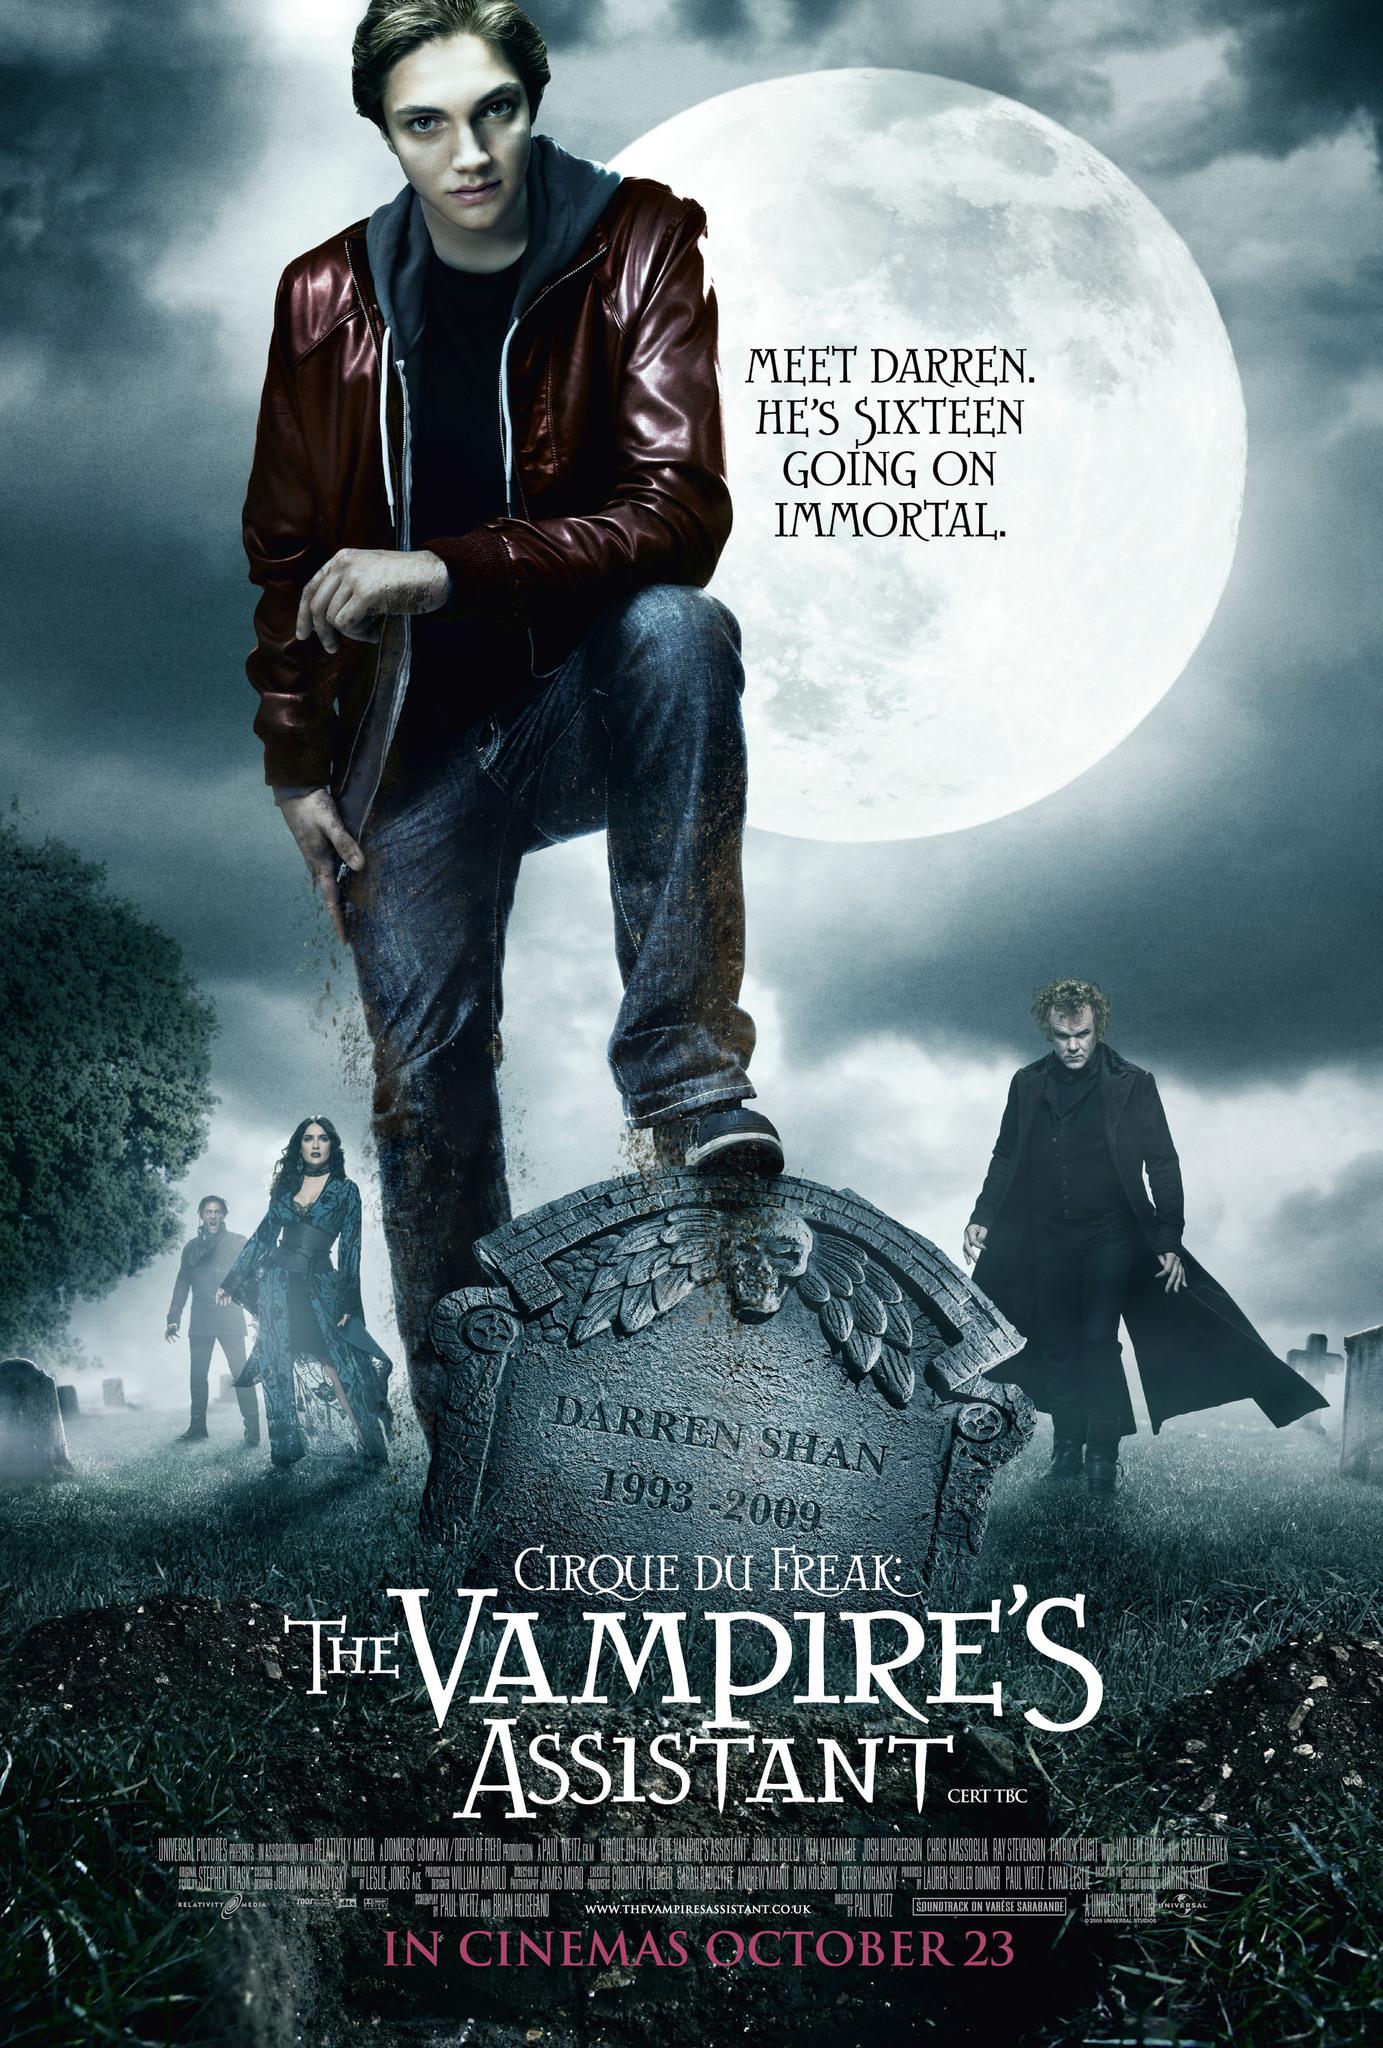 image Cirque du Freak: The Vampire's Assistant Watch Full Movie Free Online